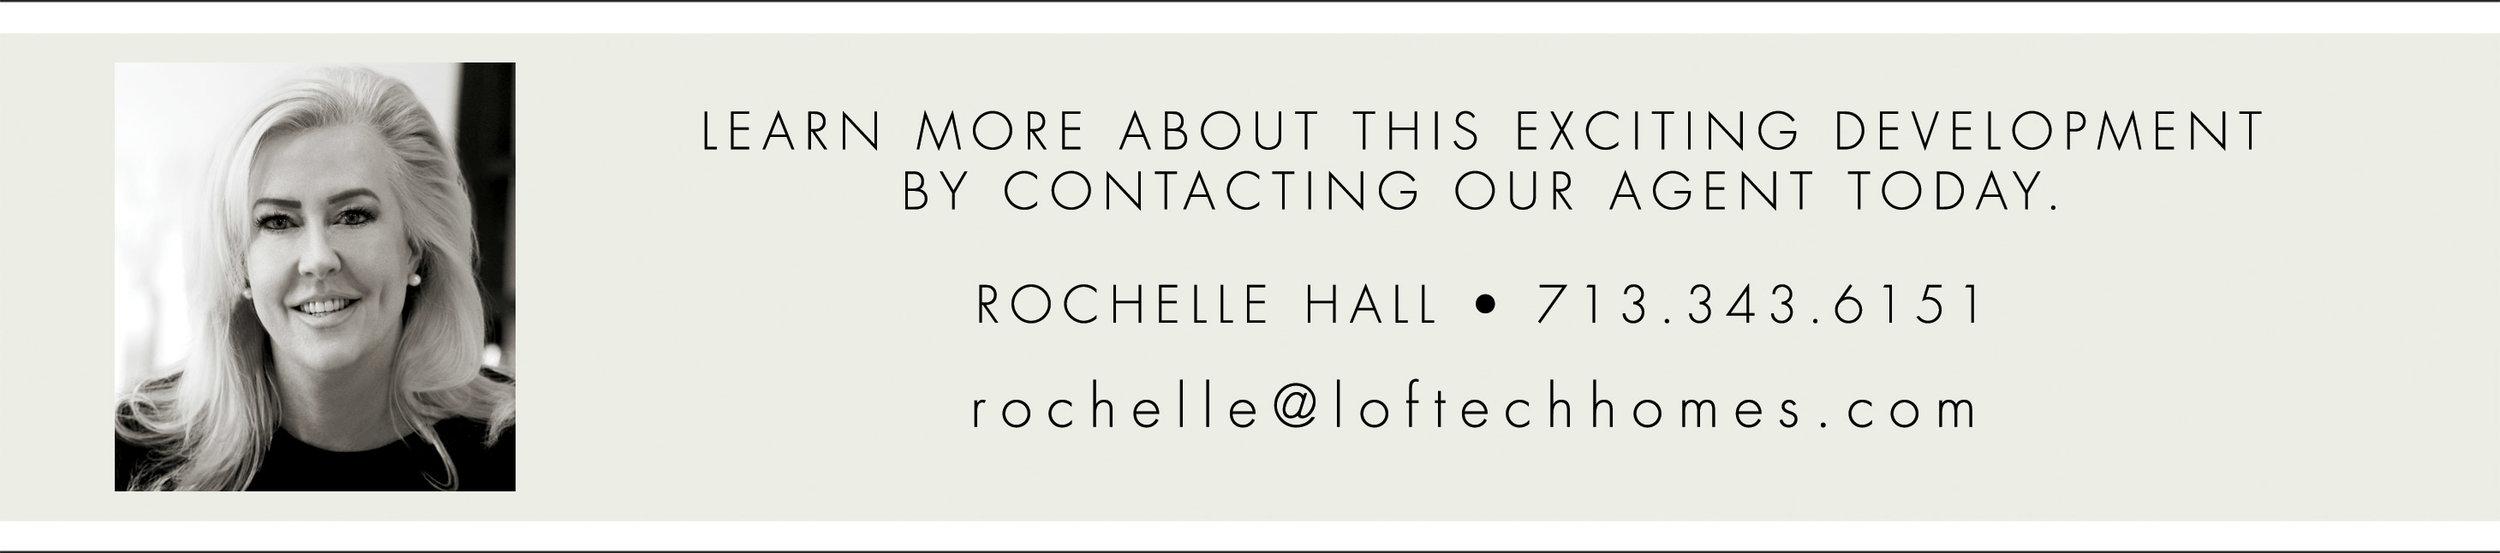 Agent Photo-Rochelle2.jpg